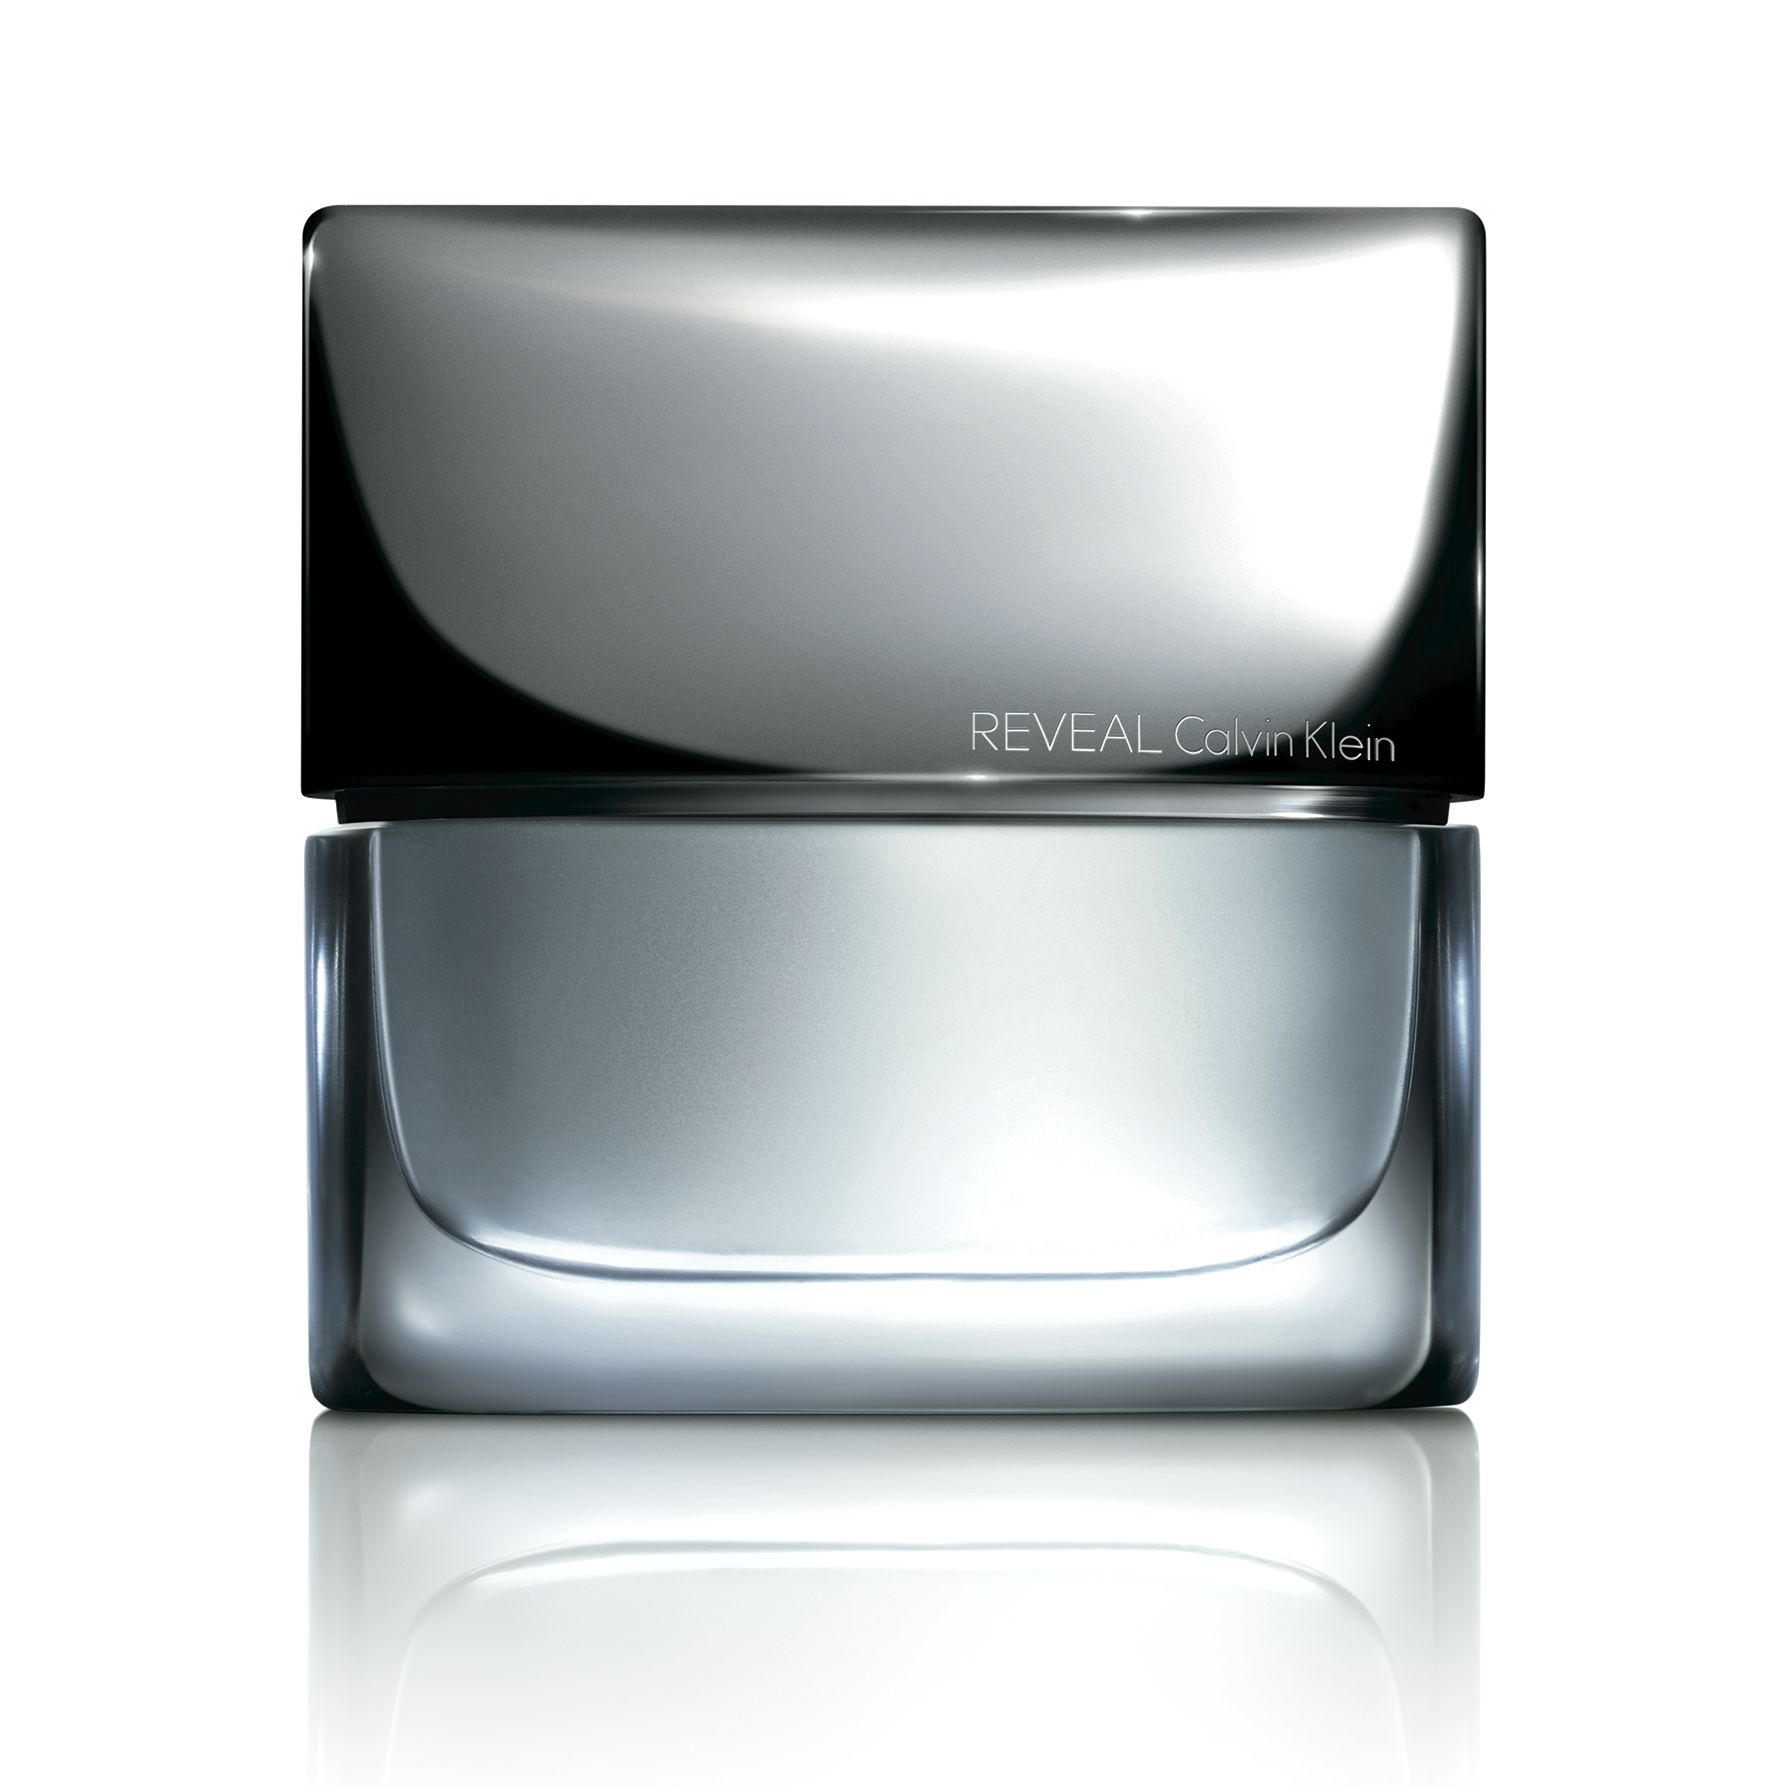 Reveal Men Calvin Klein - Best-smelling colognes